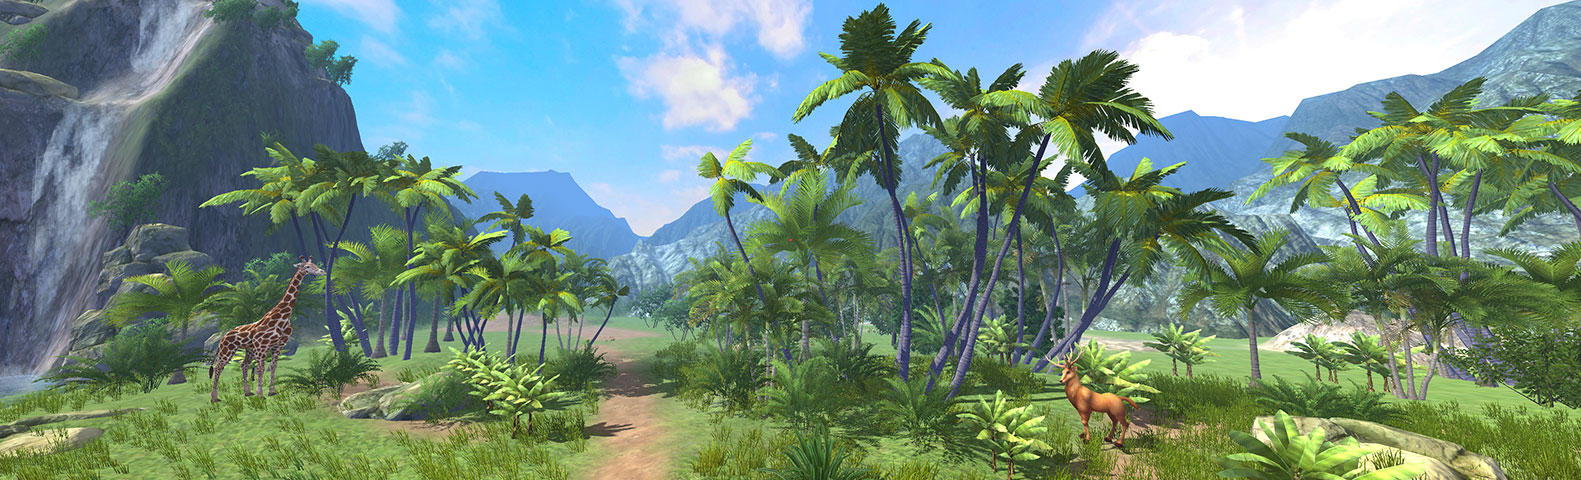 VR软件 自然环境